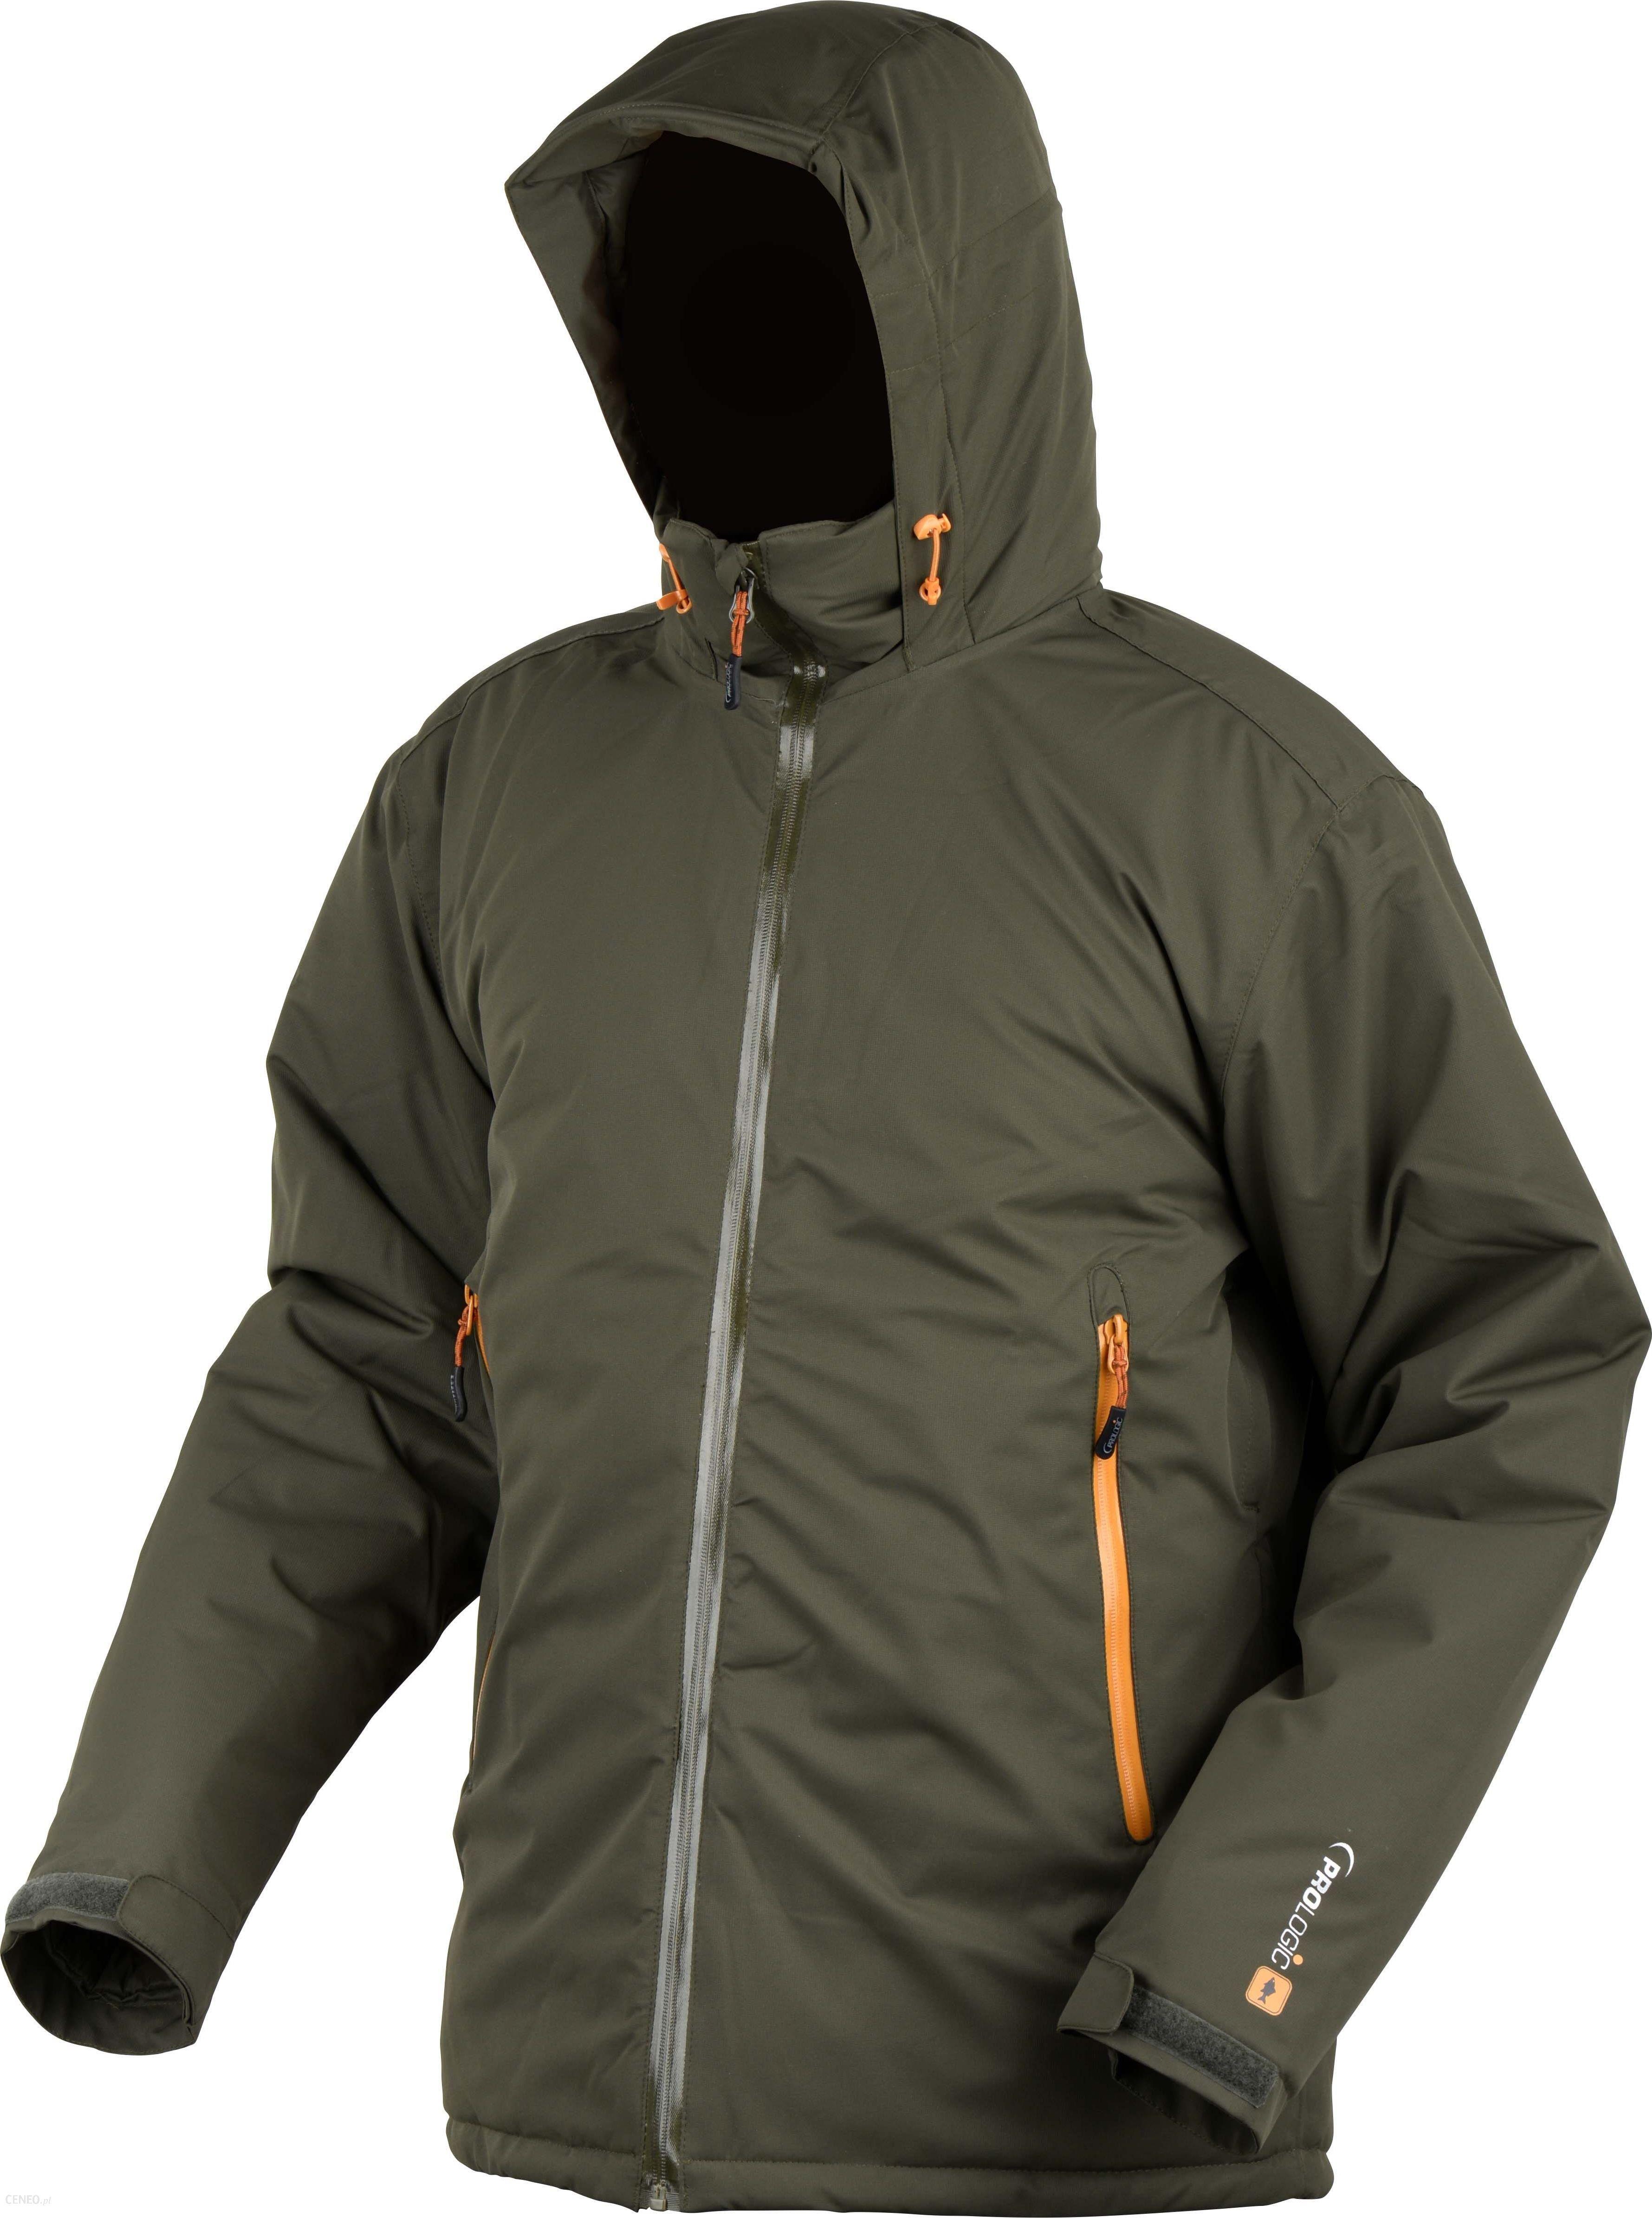 Prologic Litepro Thermo Jacket Xl (51549)